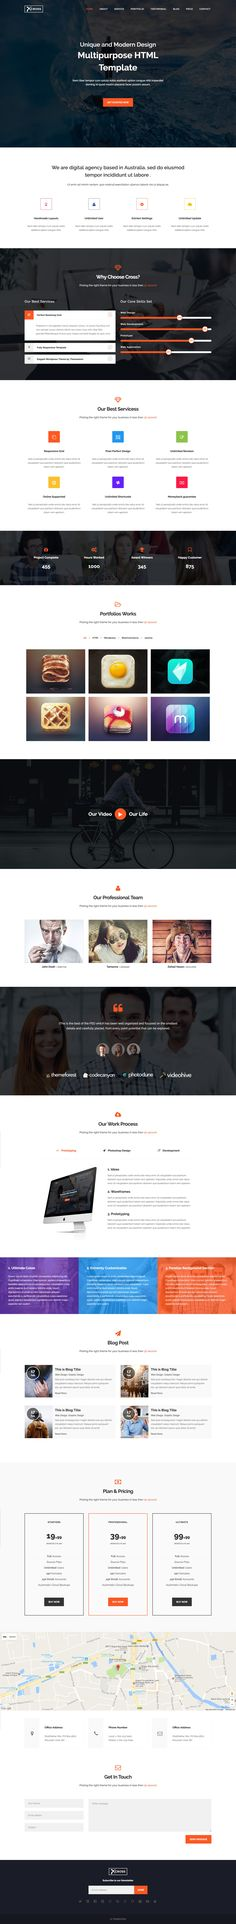 Best One Page Website Templates Images On Pinterest - E portfolio templates